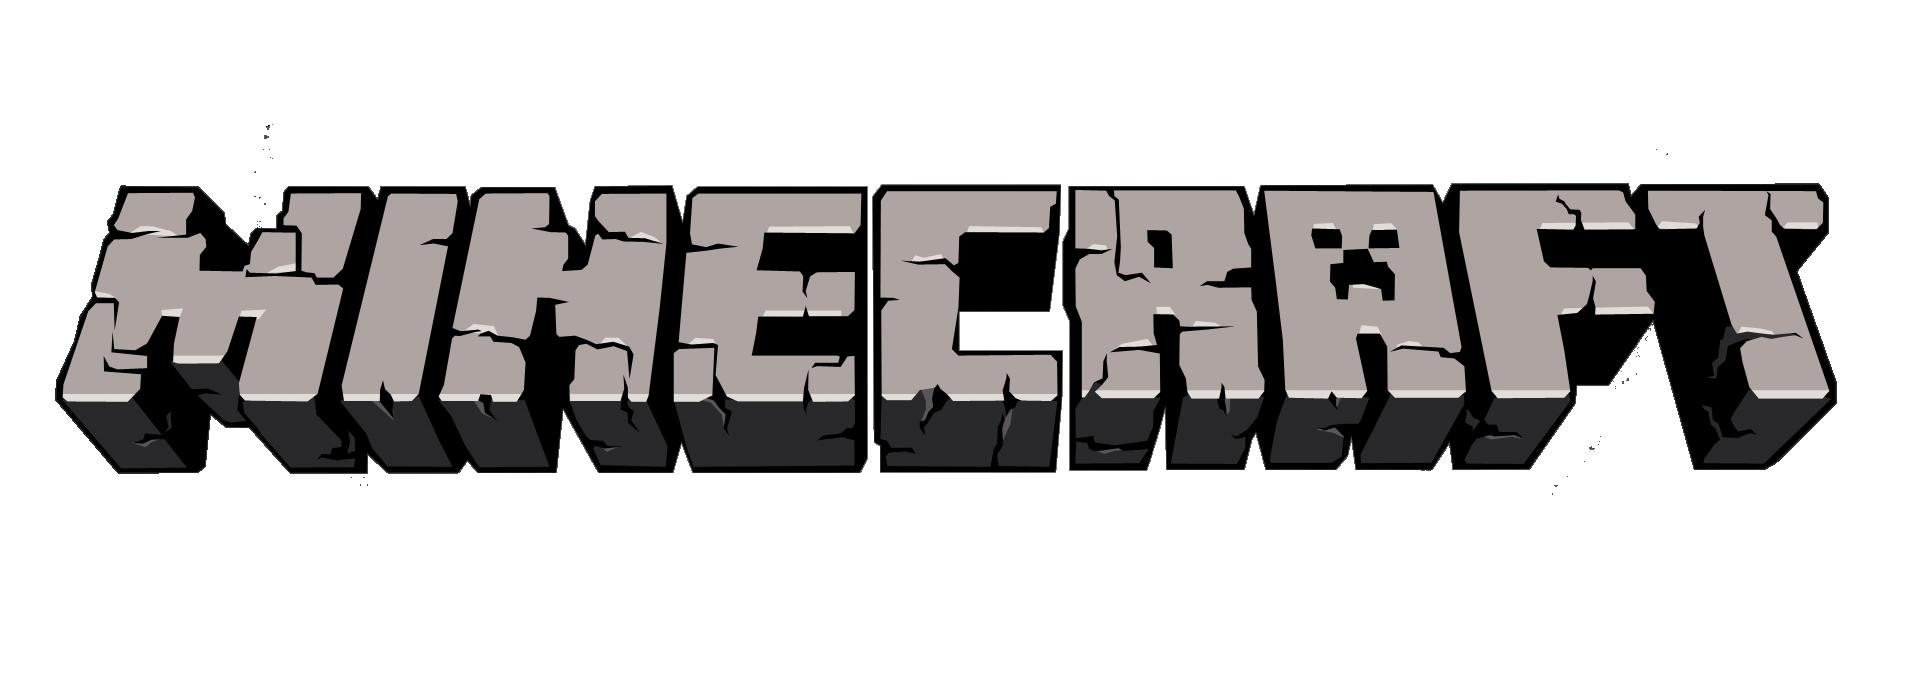 Minecraft PNG - 5588